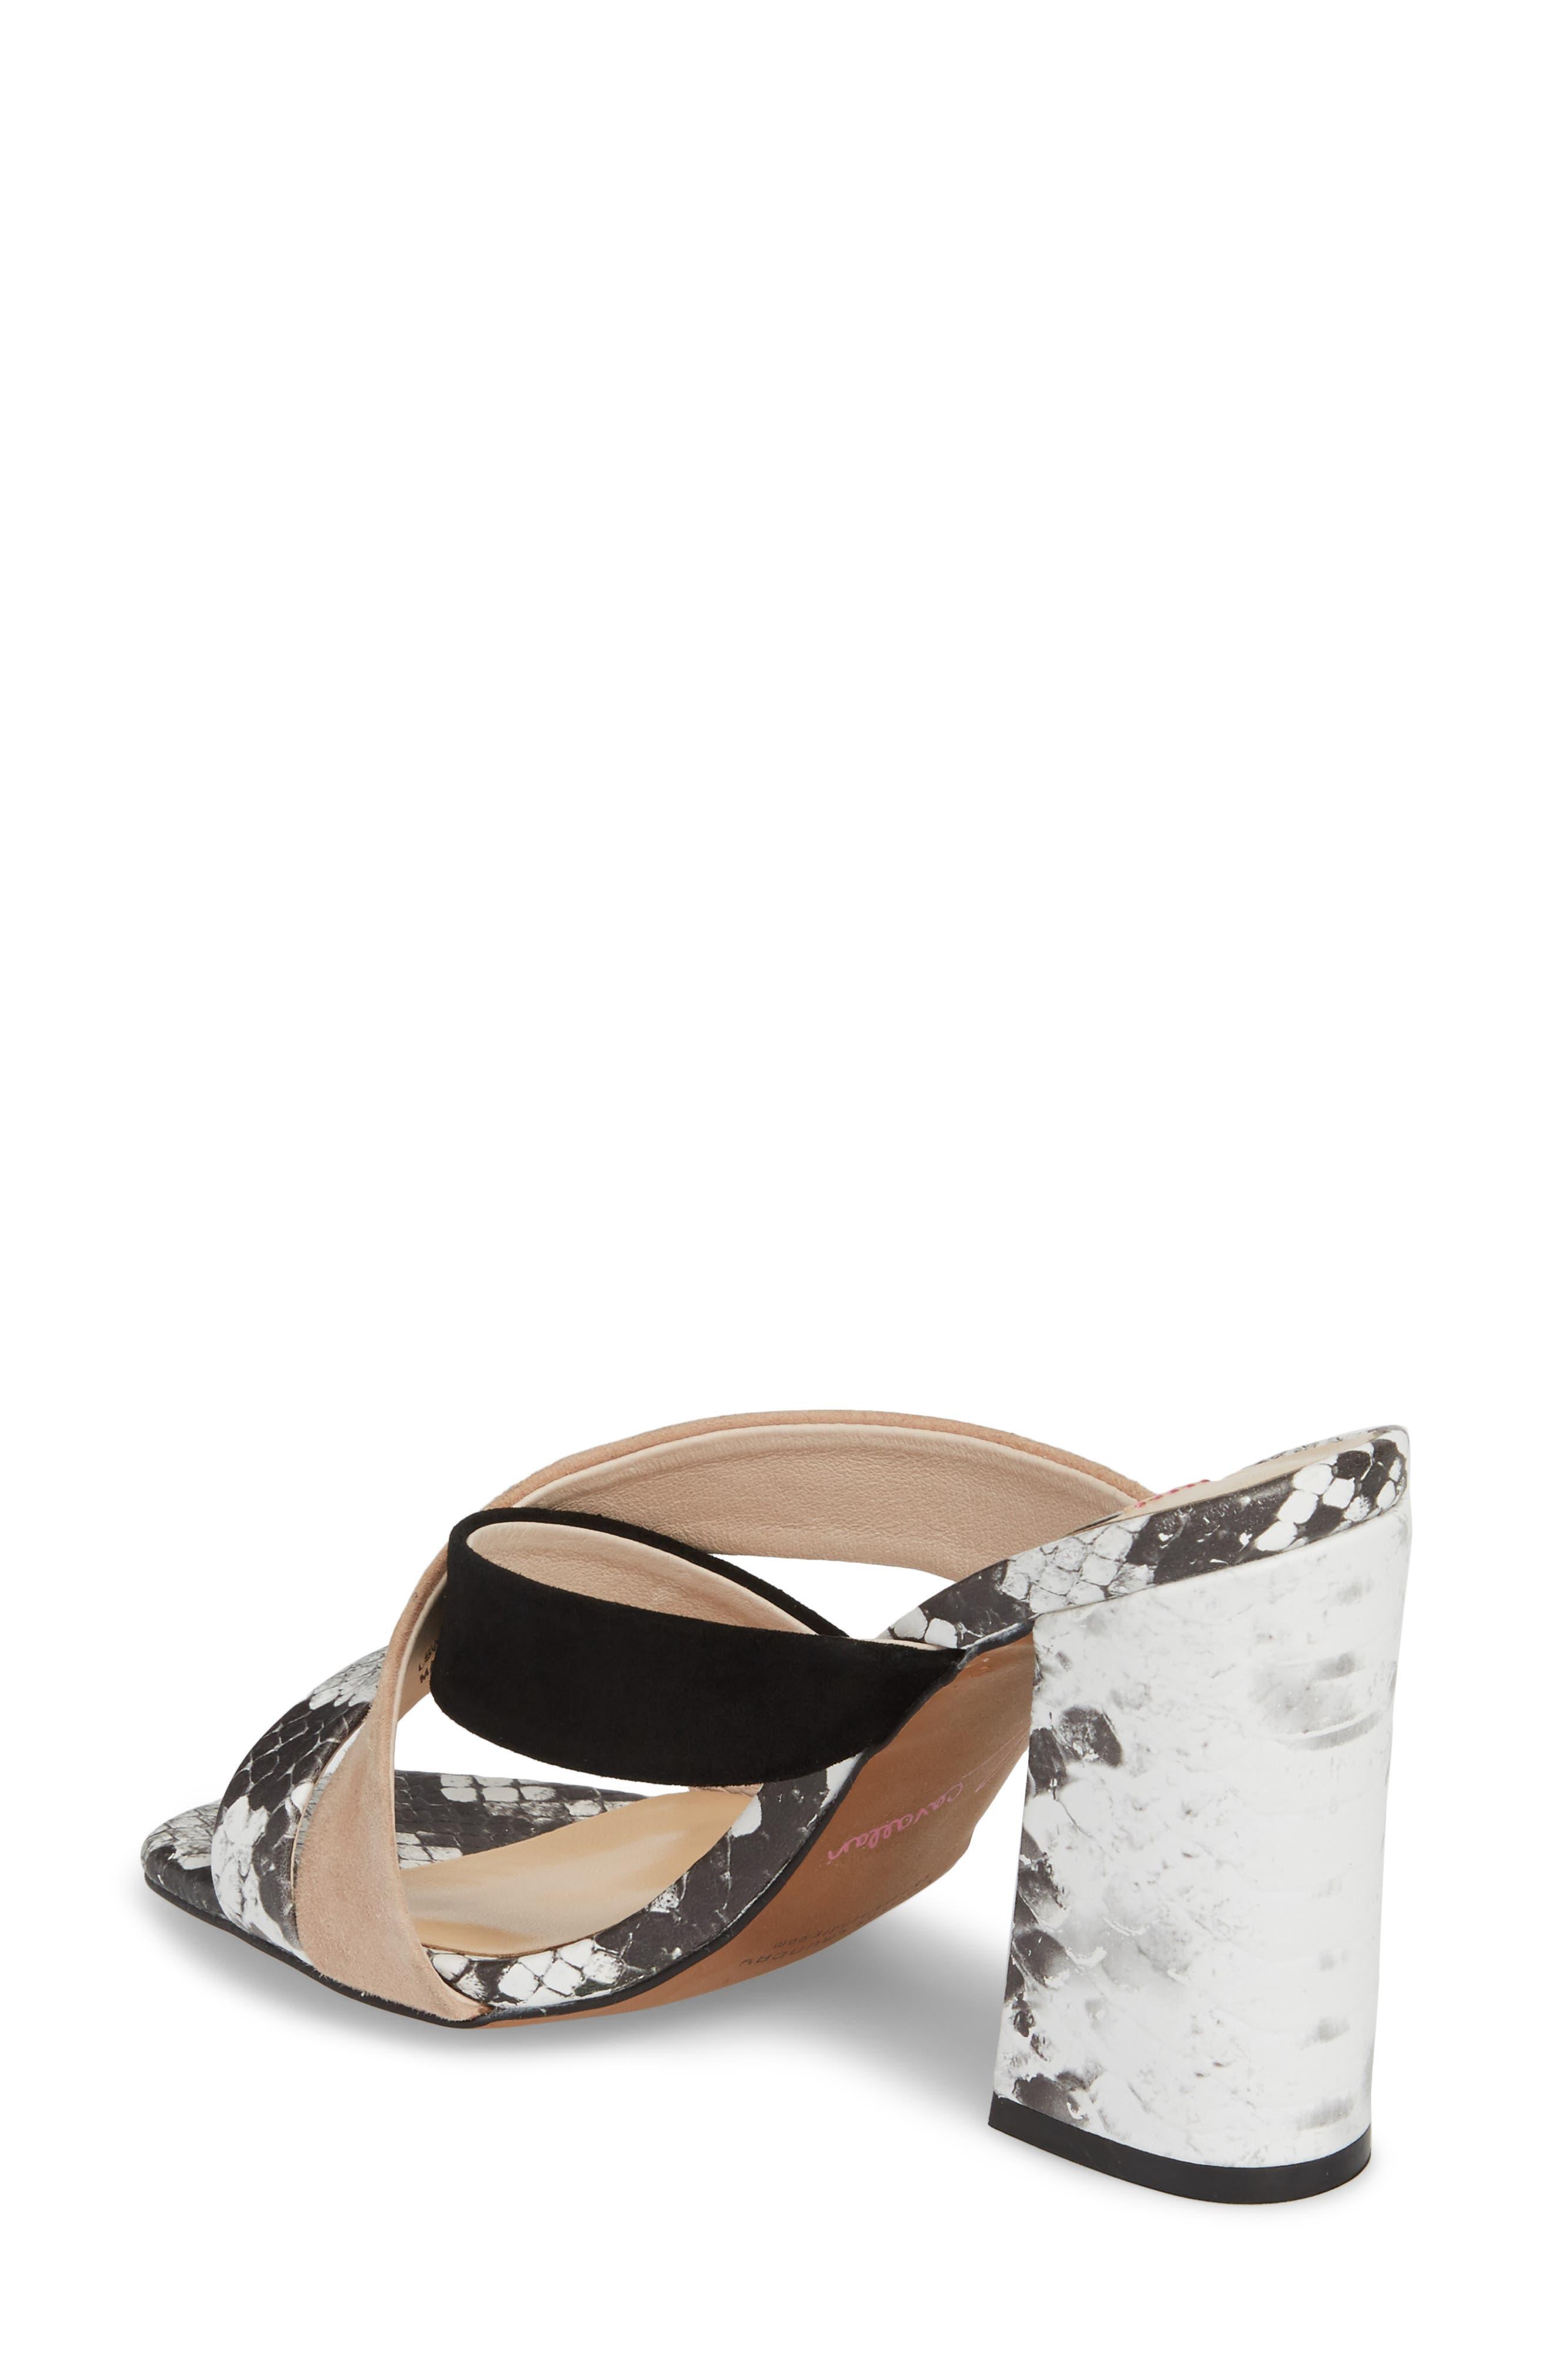 Lola Slide Sandal,                             Alternate thumbnail 2, color,                             Grey/ White Print Leather